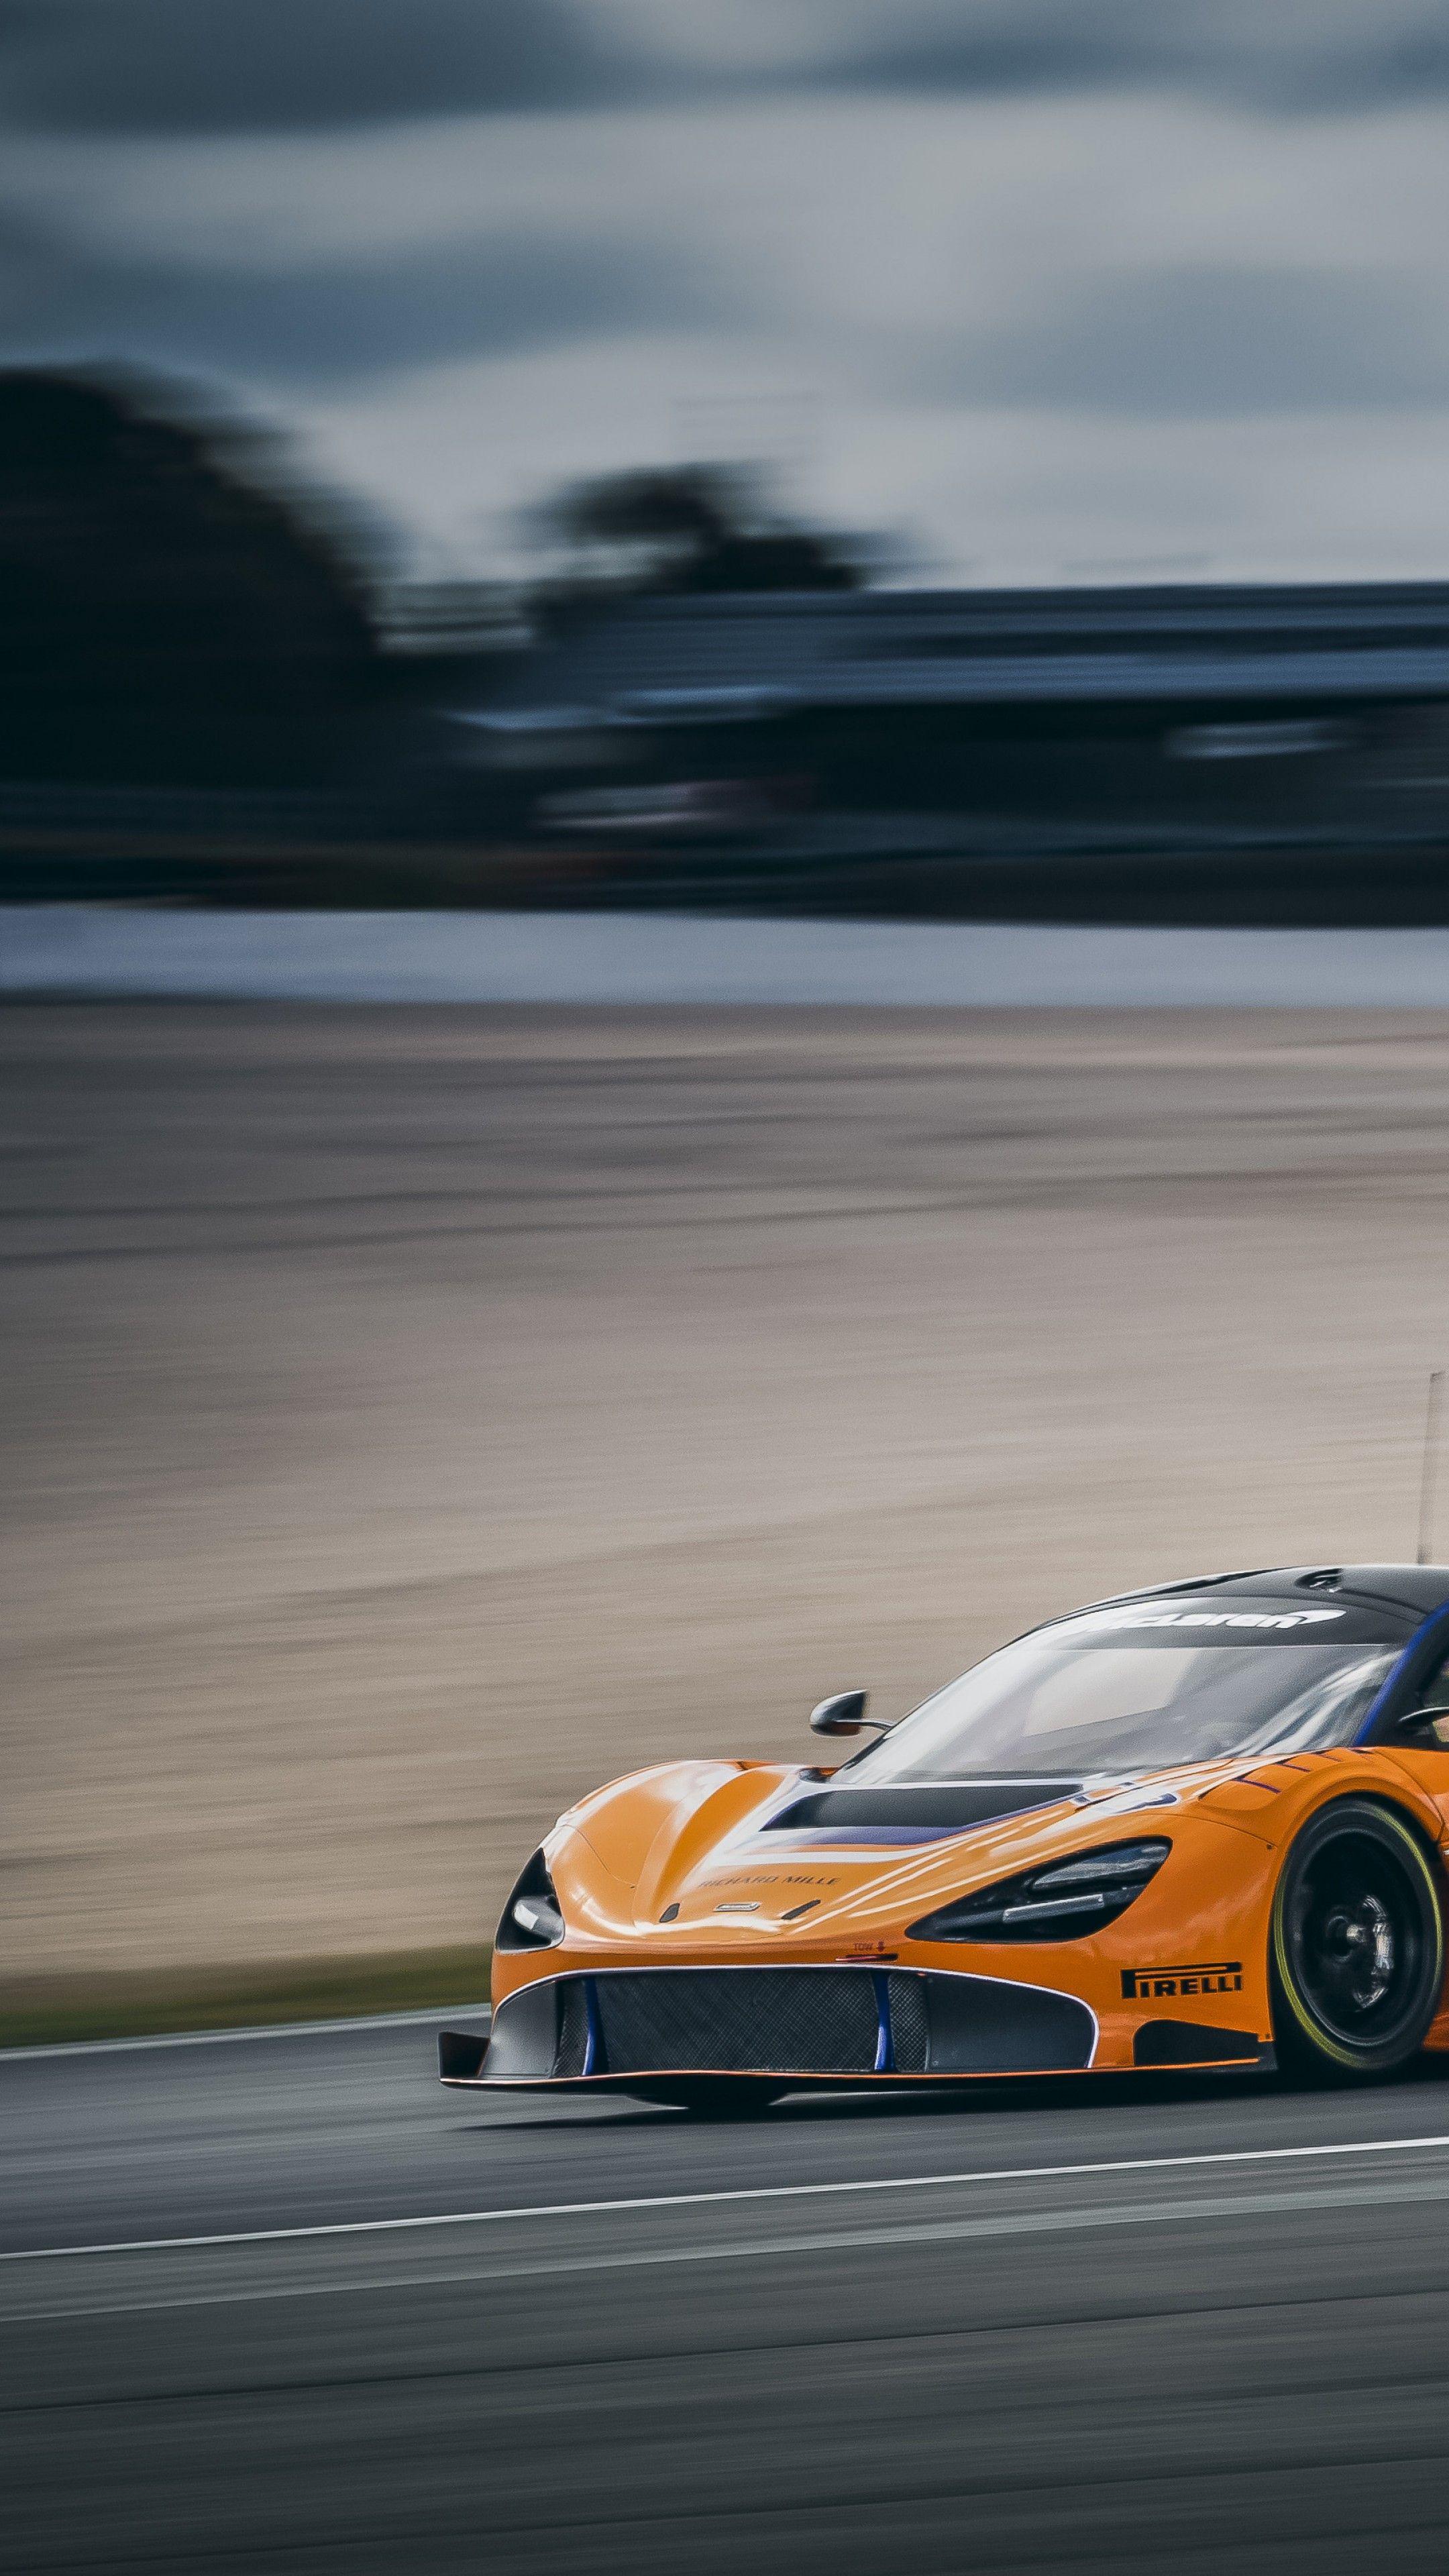 Wallpaper Mclaren 720s Gt3 Supercar 2019 Cars 4k Cars 2019